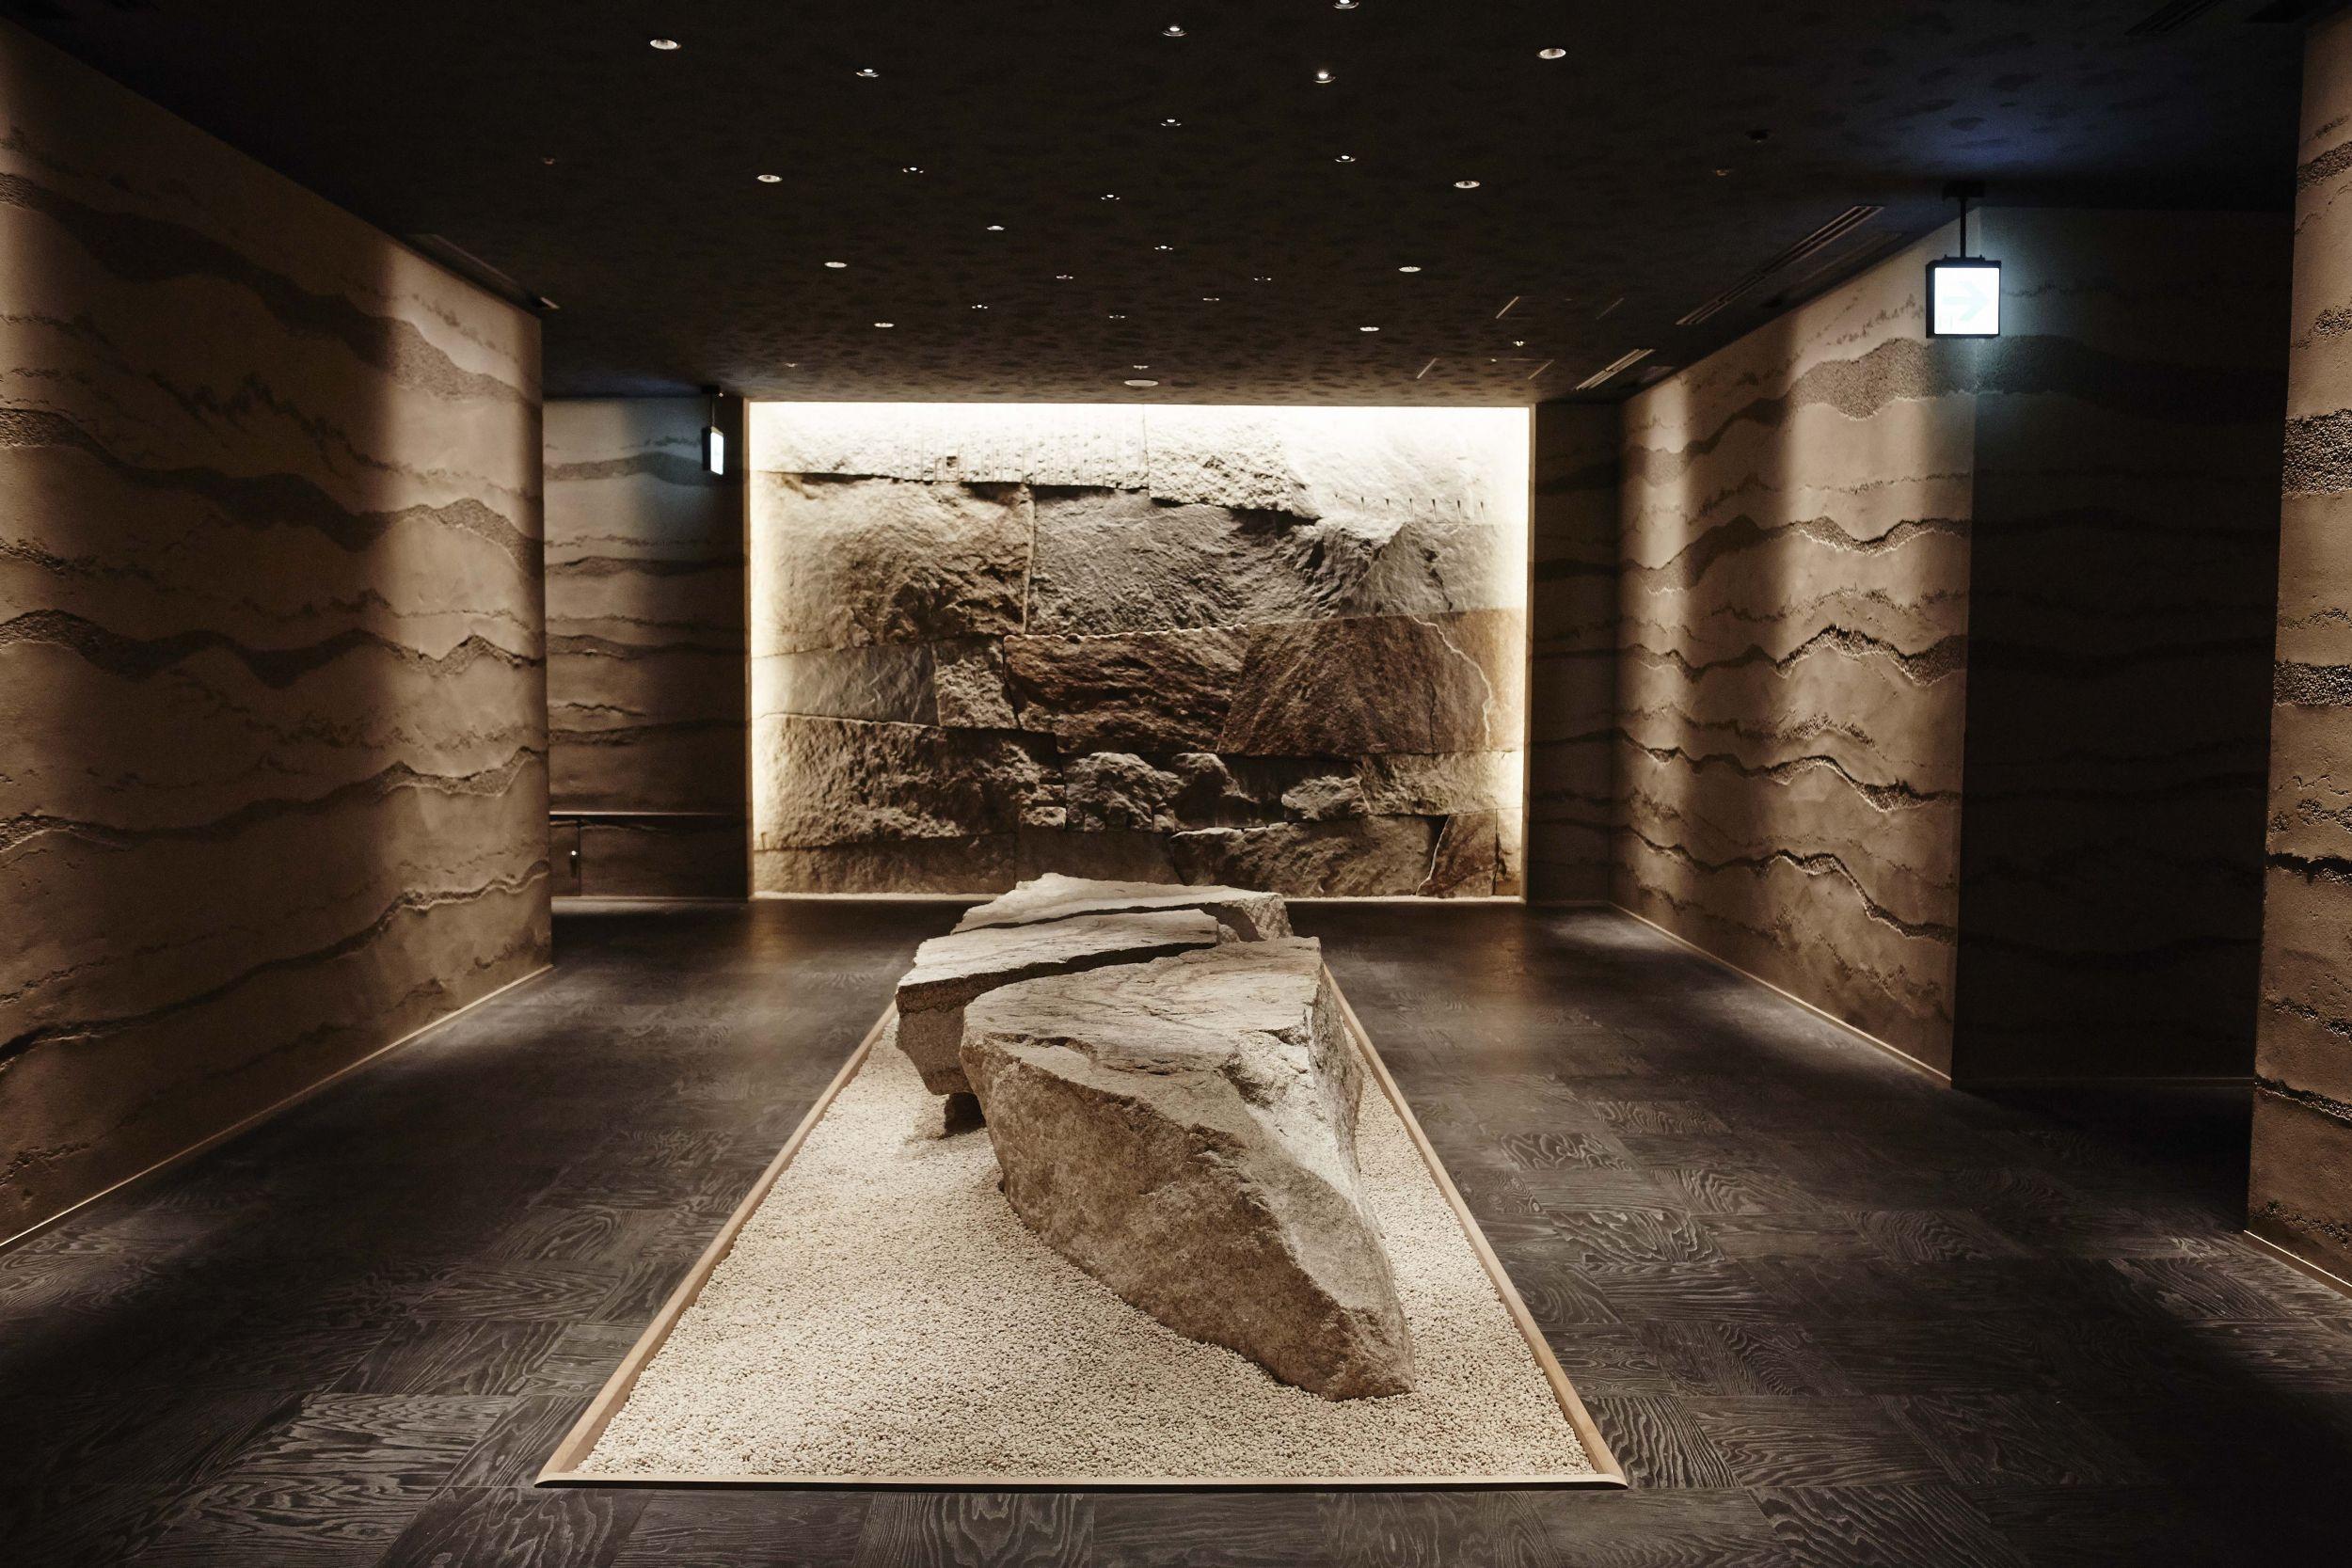 Rocks of hot spring construction, used to decorate Hamada restaurant (Hoshinoya / PA)